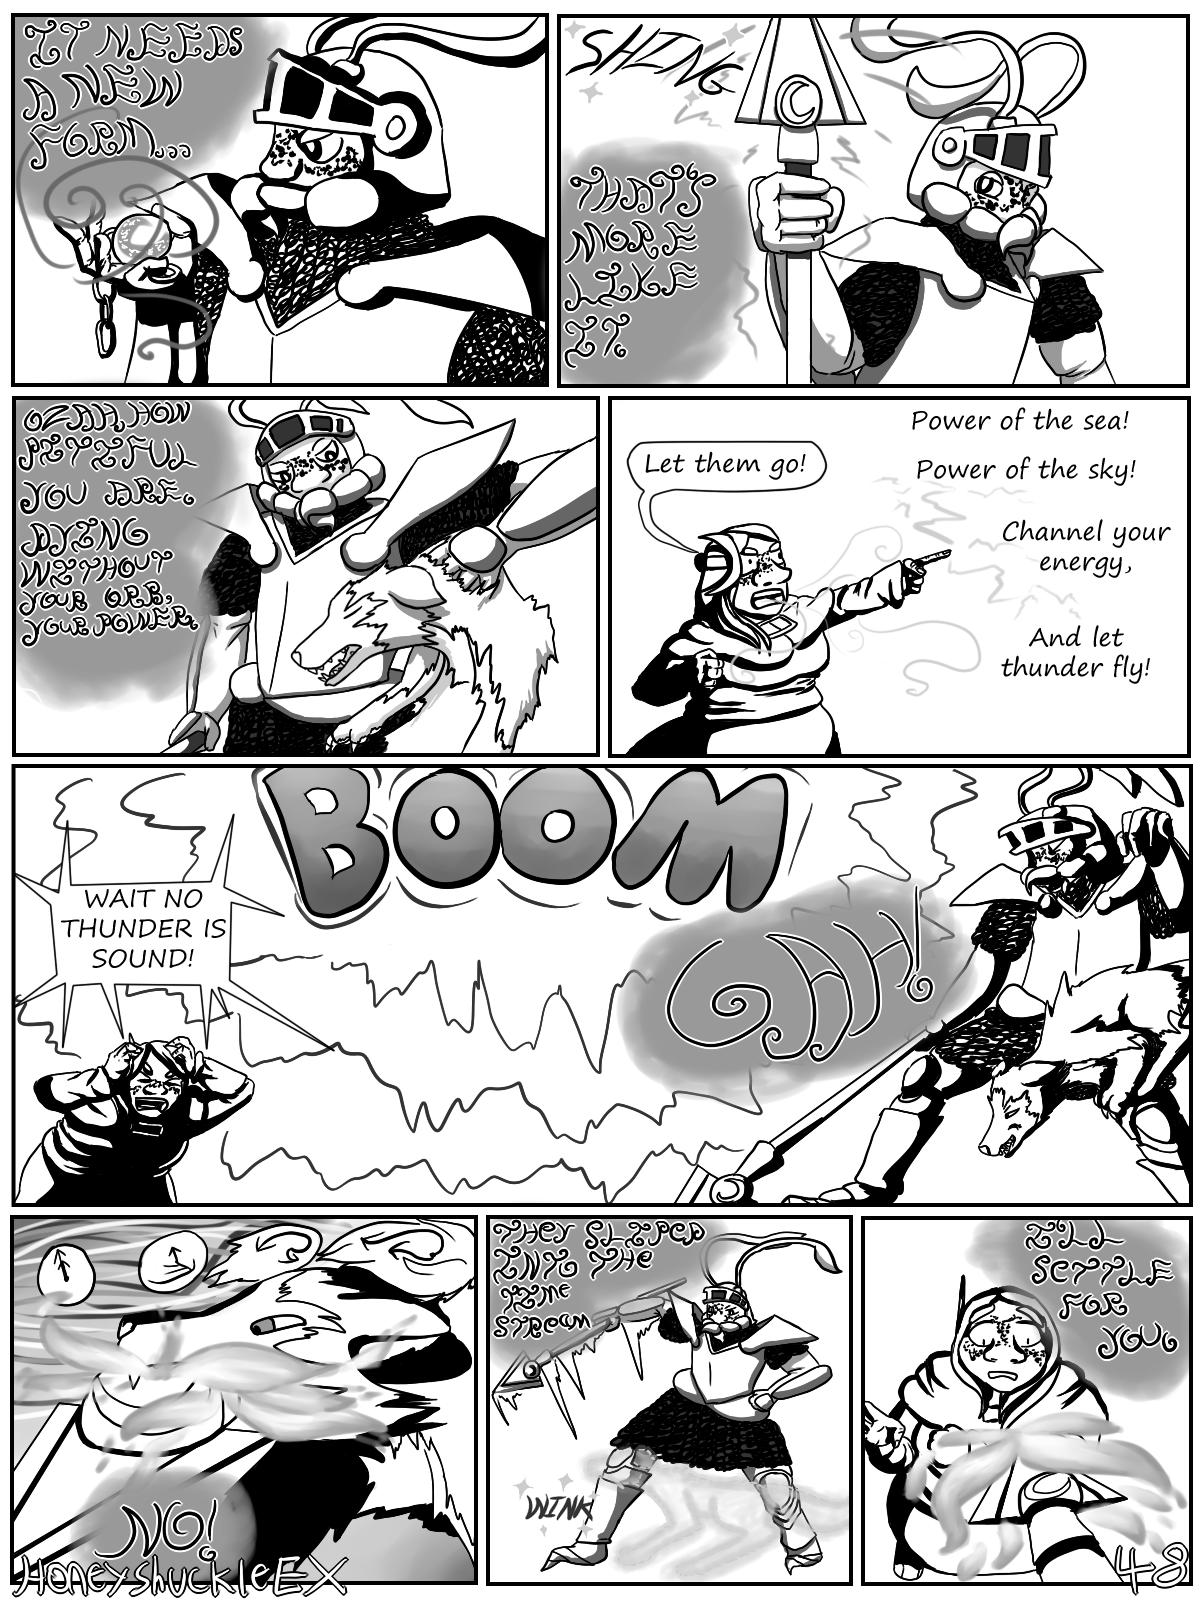 Pixie Dust page 48